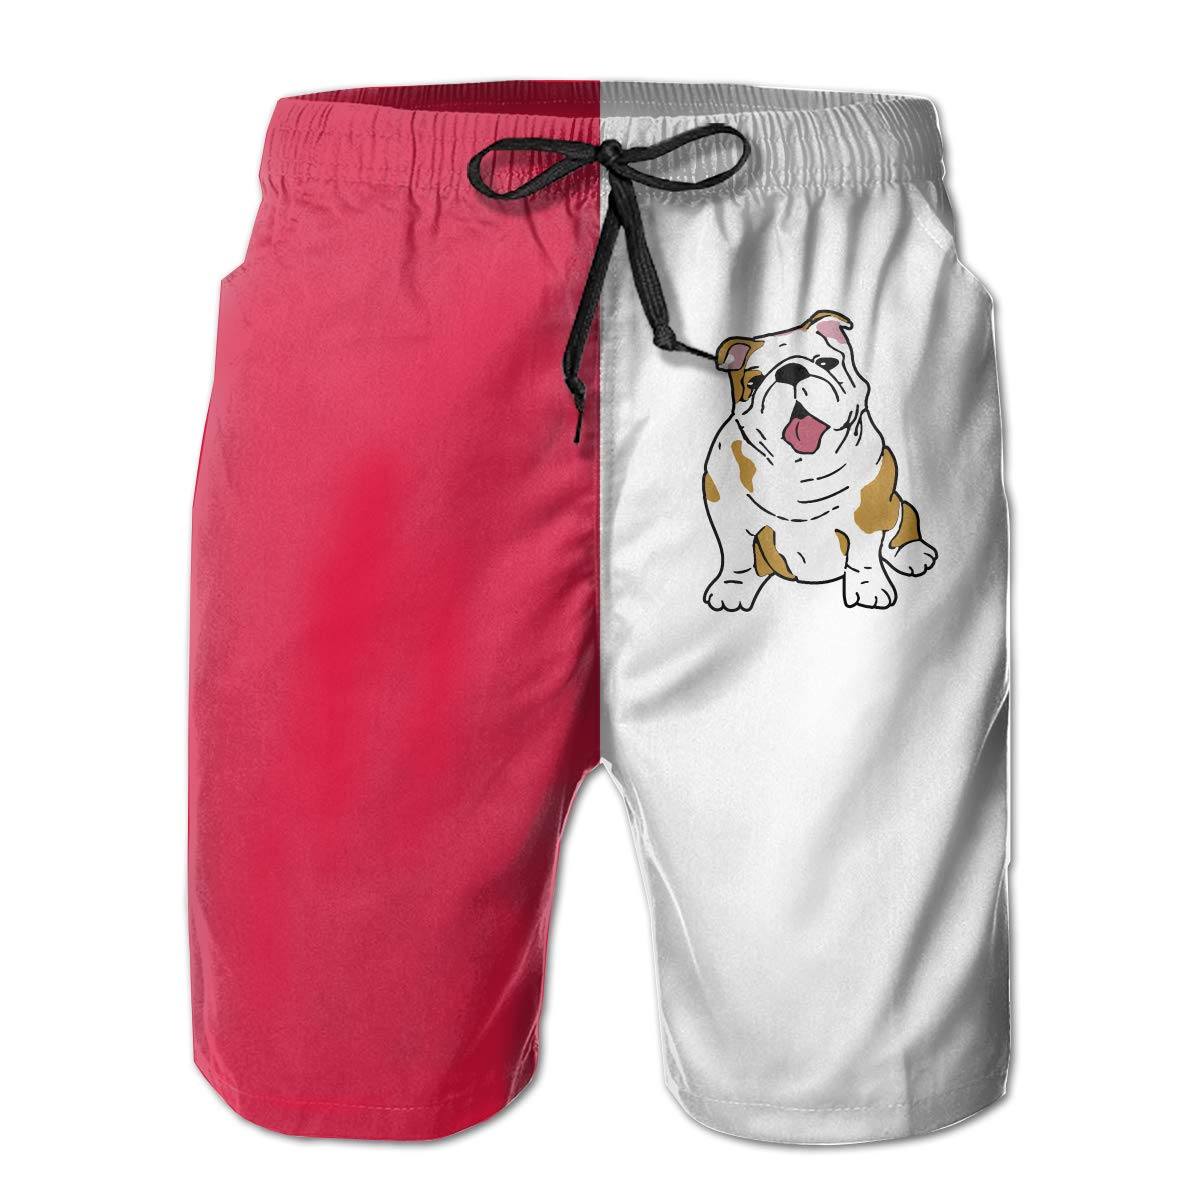 Polyester English Bulldog Board Shorts with Pockets Xk7@KU Mens Quick Dry Swim Trunks